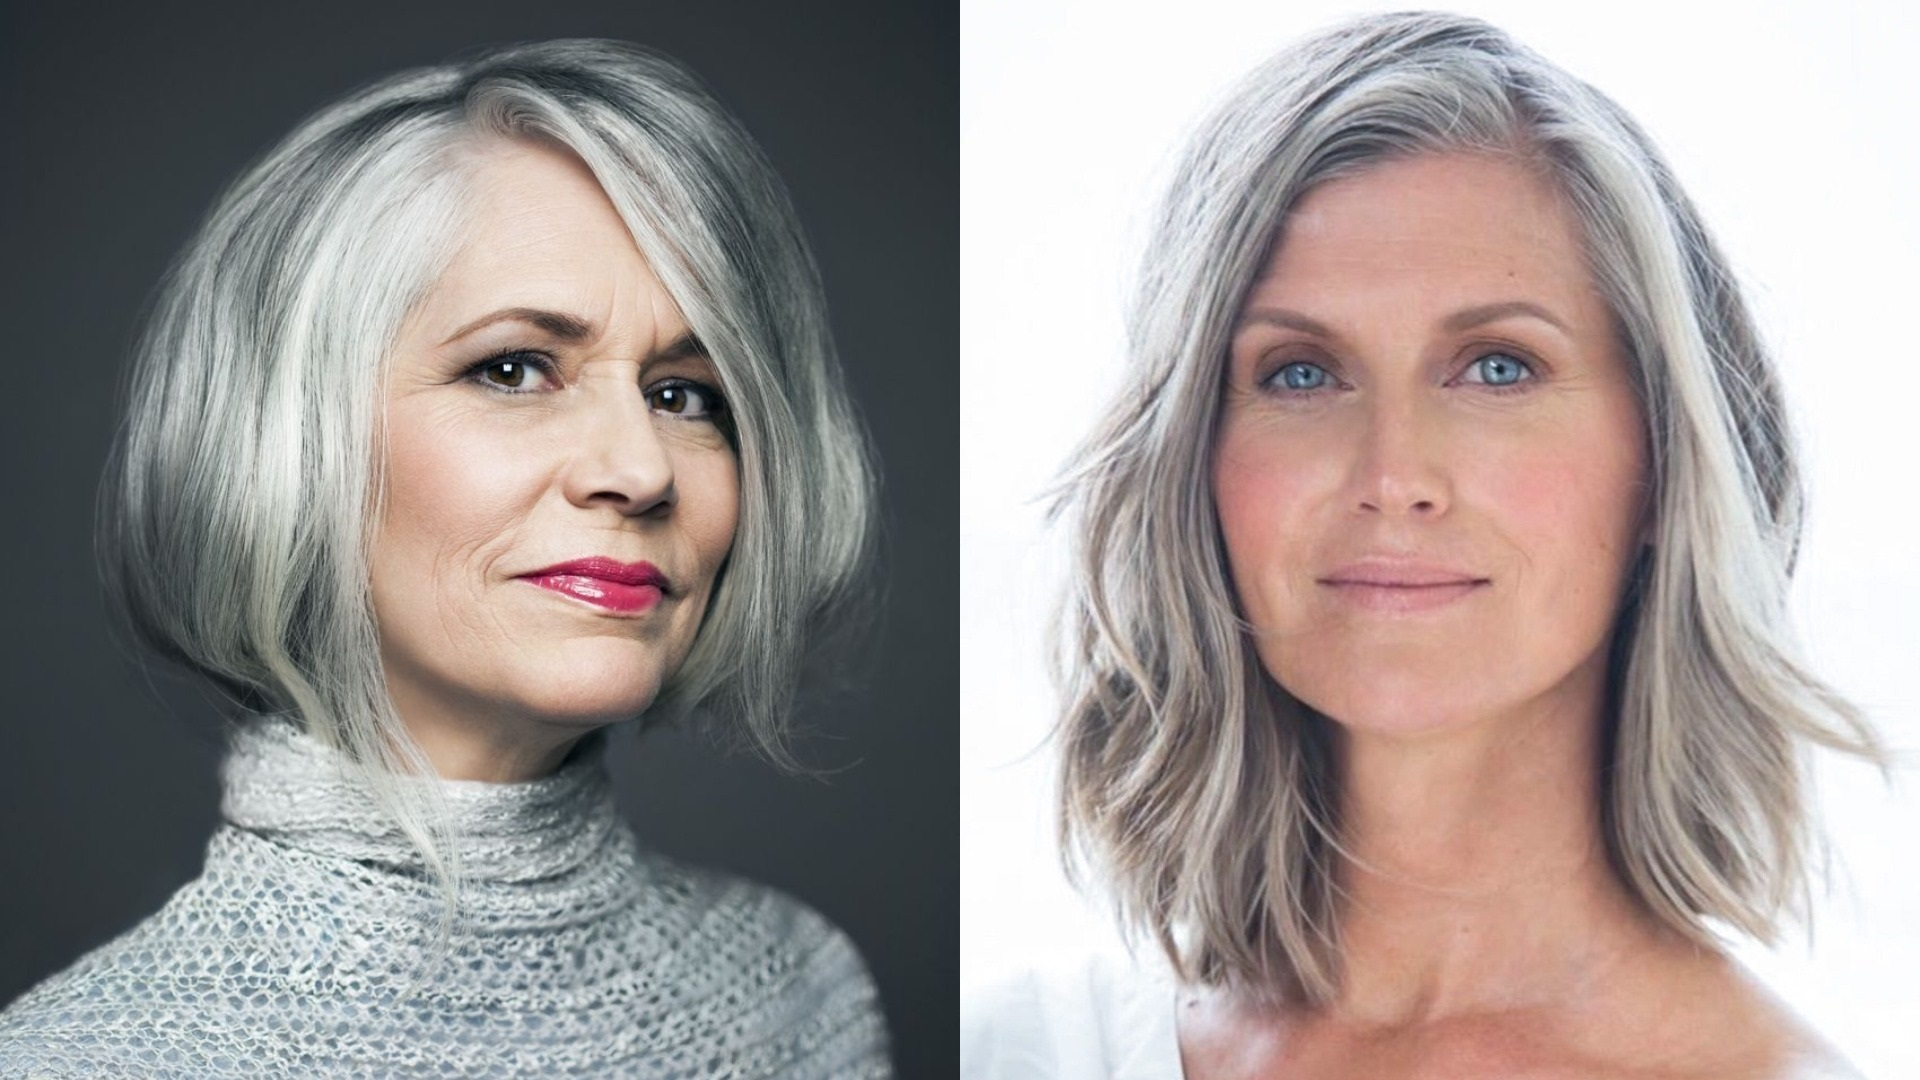 Grey-Hairstyles-for-Older-Women Glamorous Grey Hairstyles for Older Women